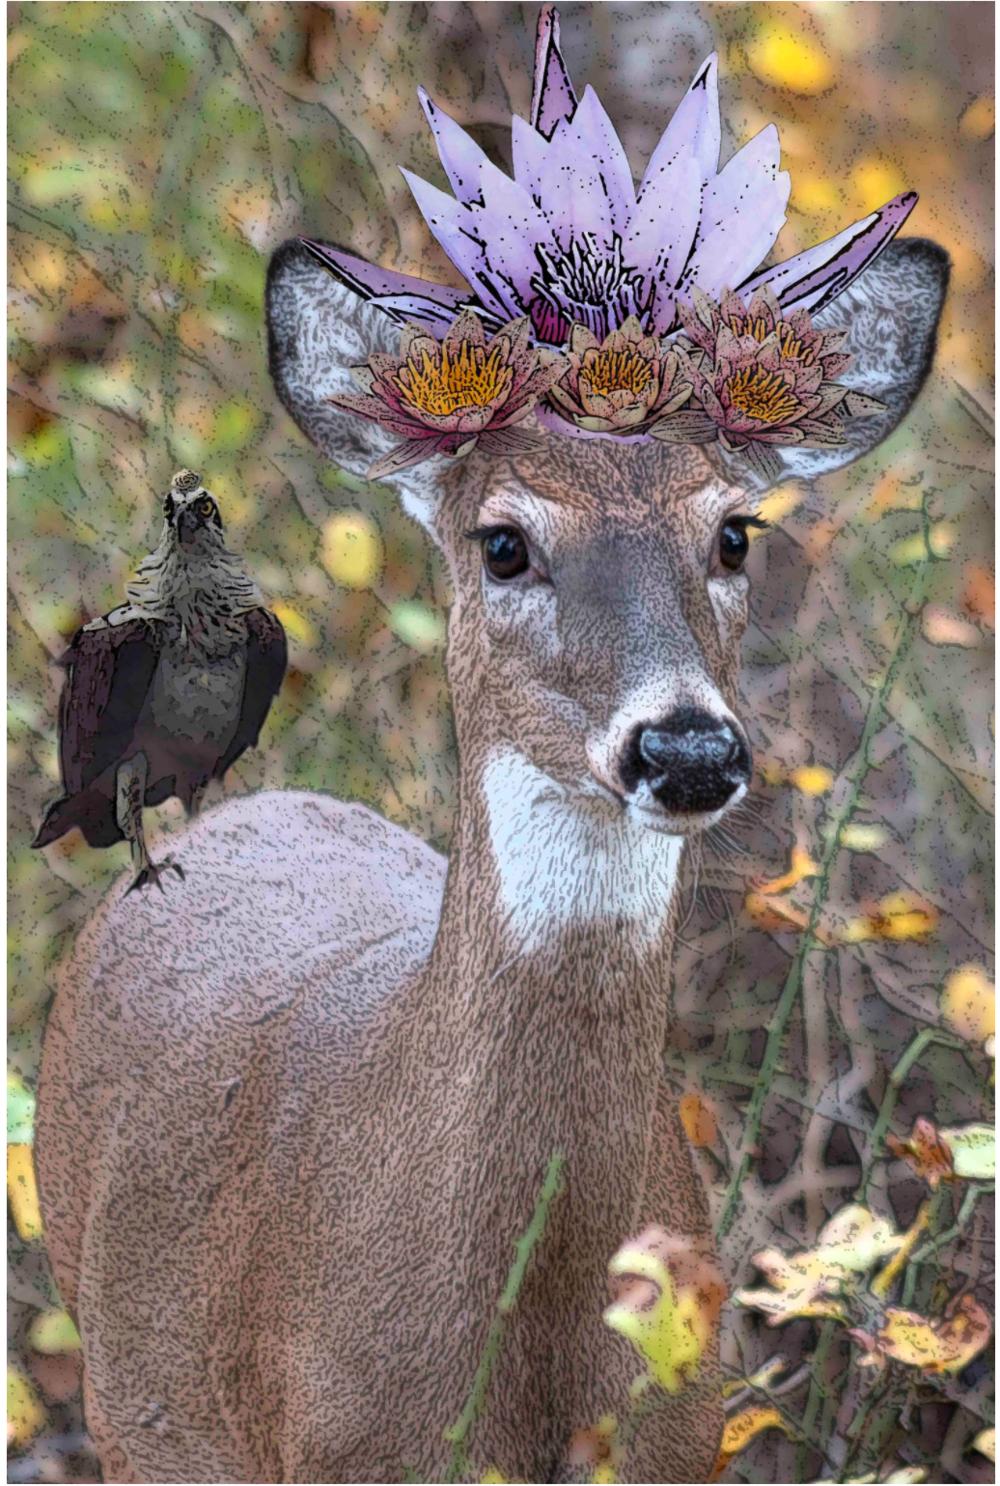 Oh Deer - 2k16 Rye Marshlands ConservancyFoto ShowRye, NY October 2k16